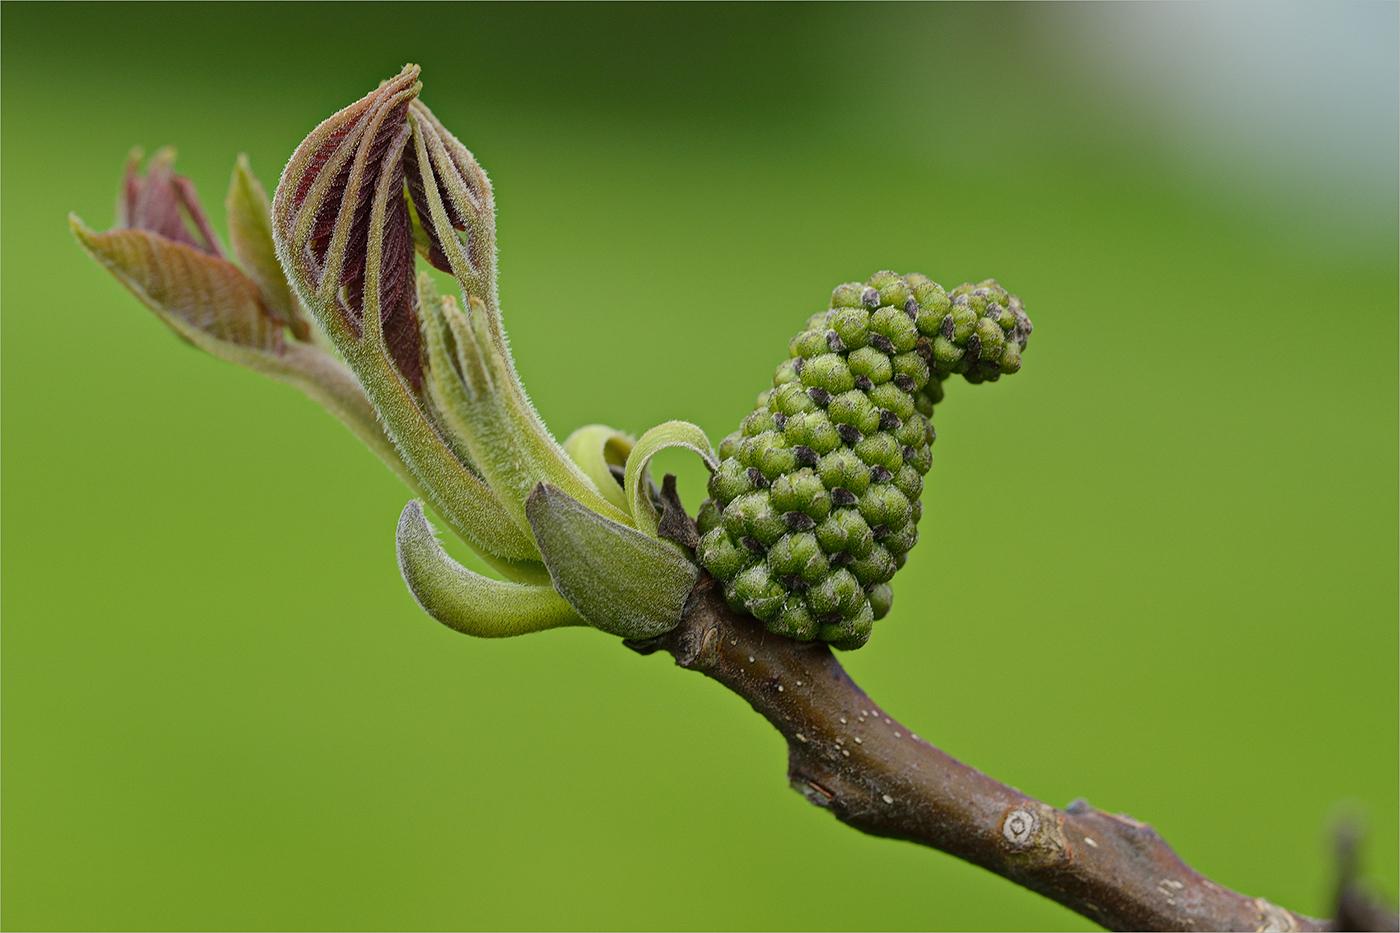 nussbaum bl te foto bild pflanzen pilze flechten bl ten kleinpflanzen natur bilder. Black Bedroom Furniture Sets. Home Design Ideas